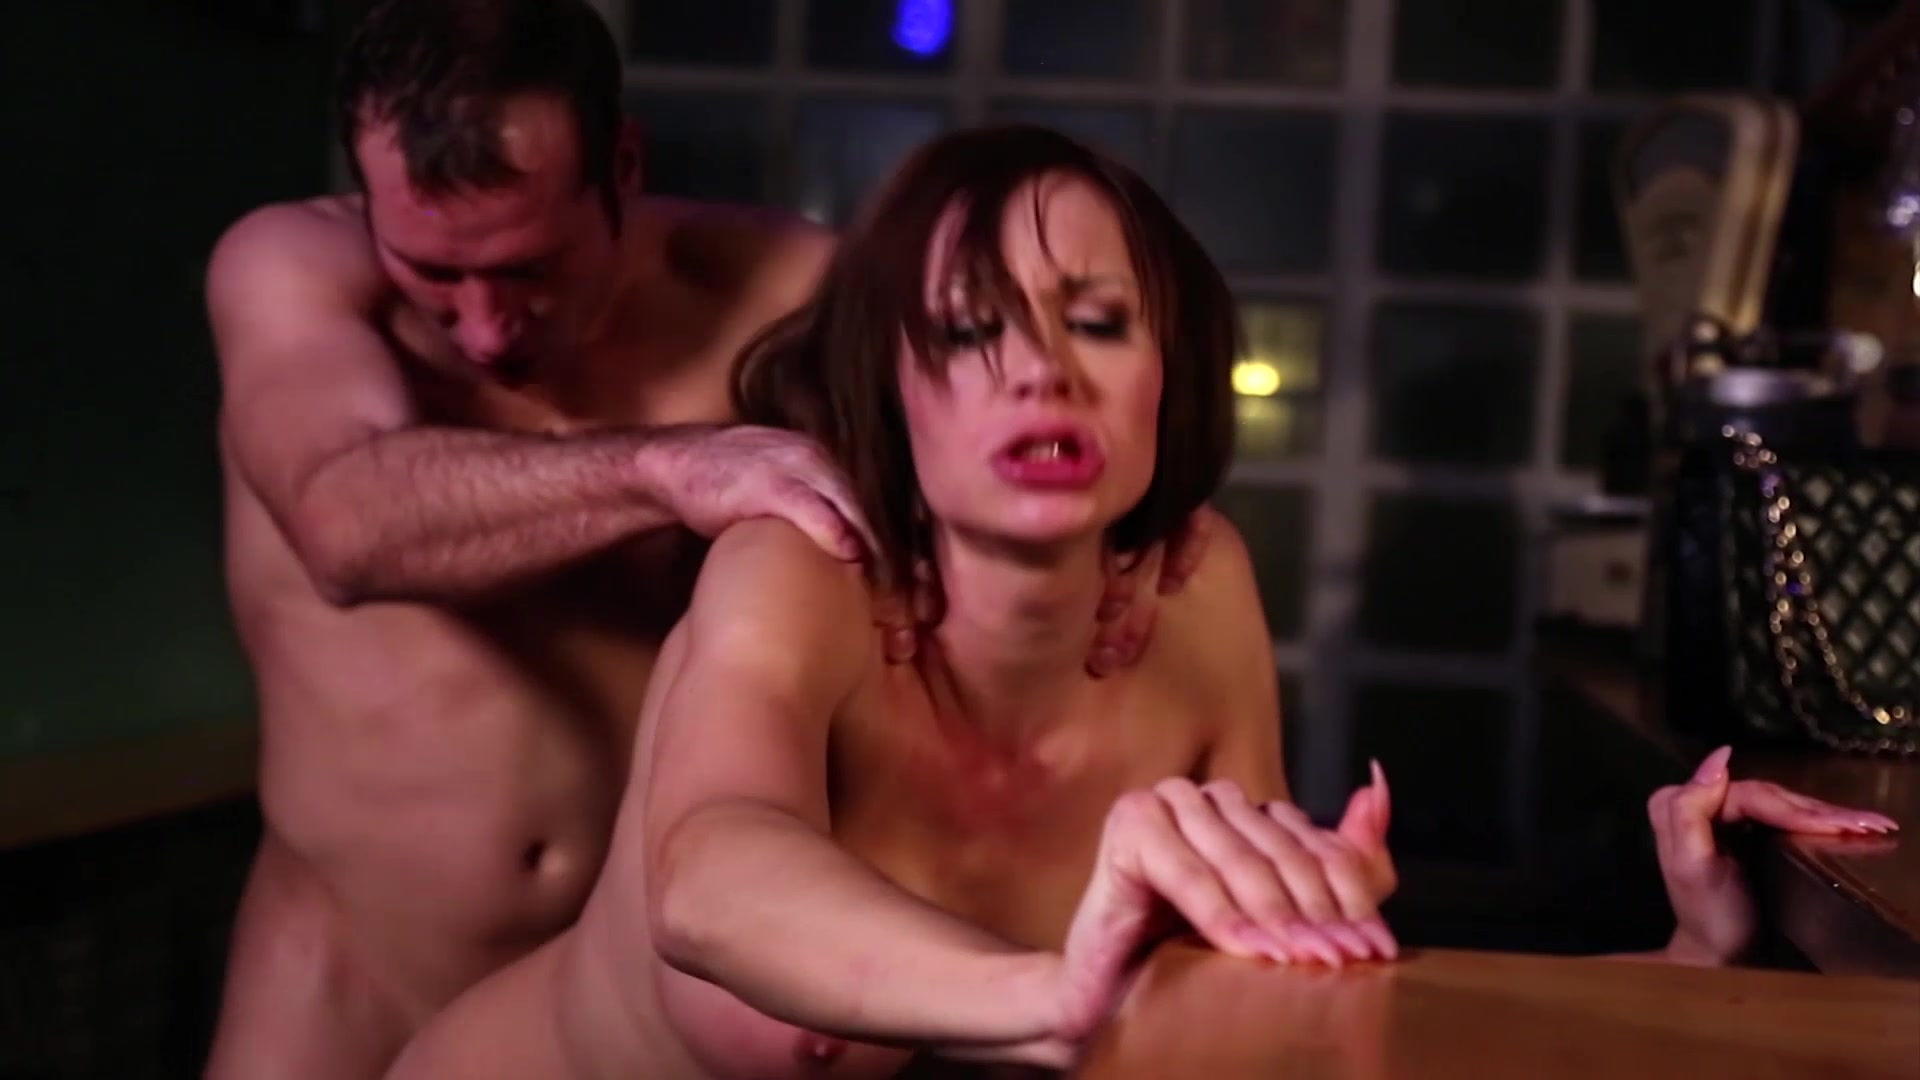 _MagmaFilm_-KimberLee-Big-Tits-and-an-Even-Bigger-_Naked-Punch_-24-04-2015-SHEMALEHD.NET.00109.jpg